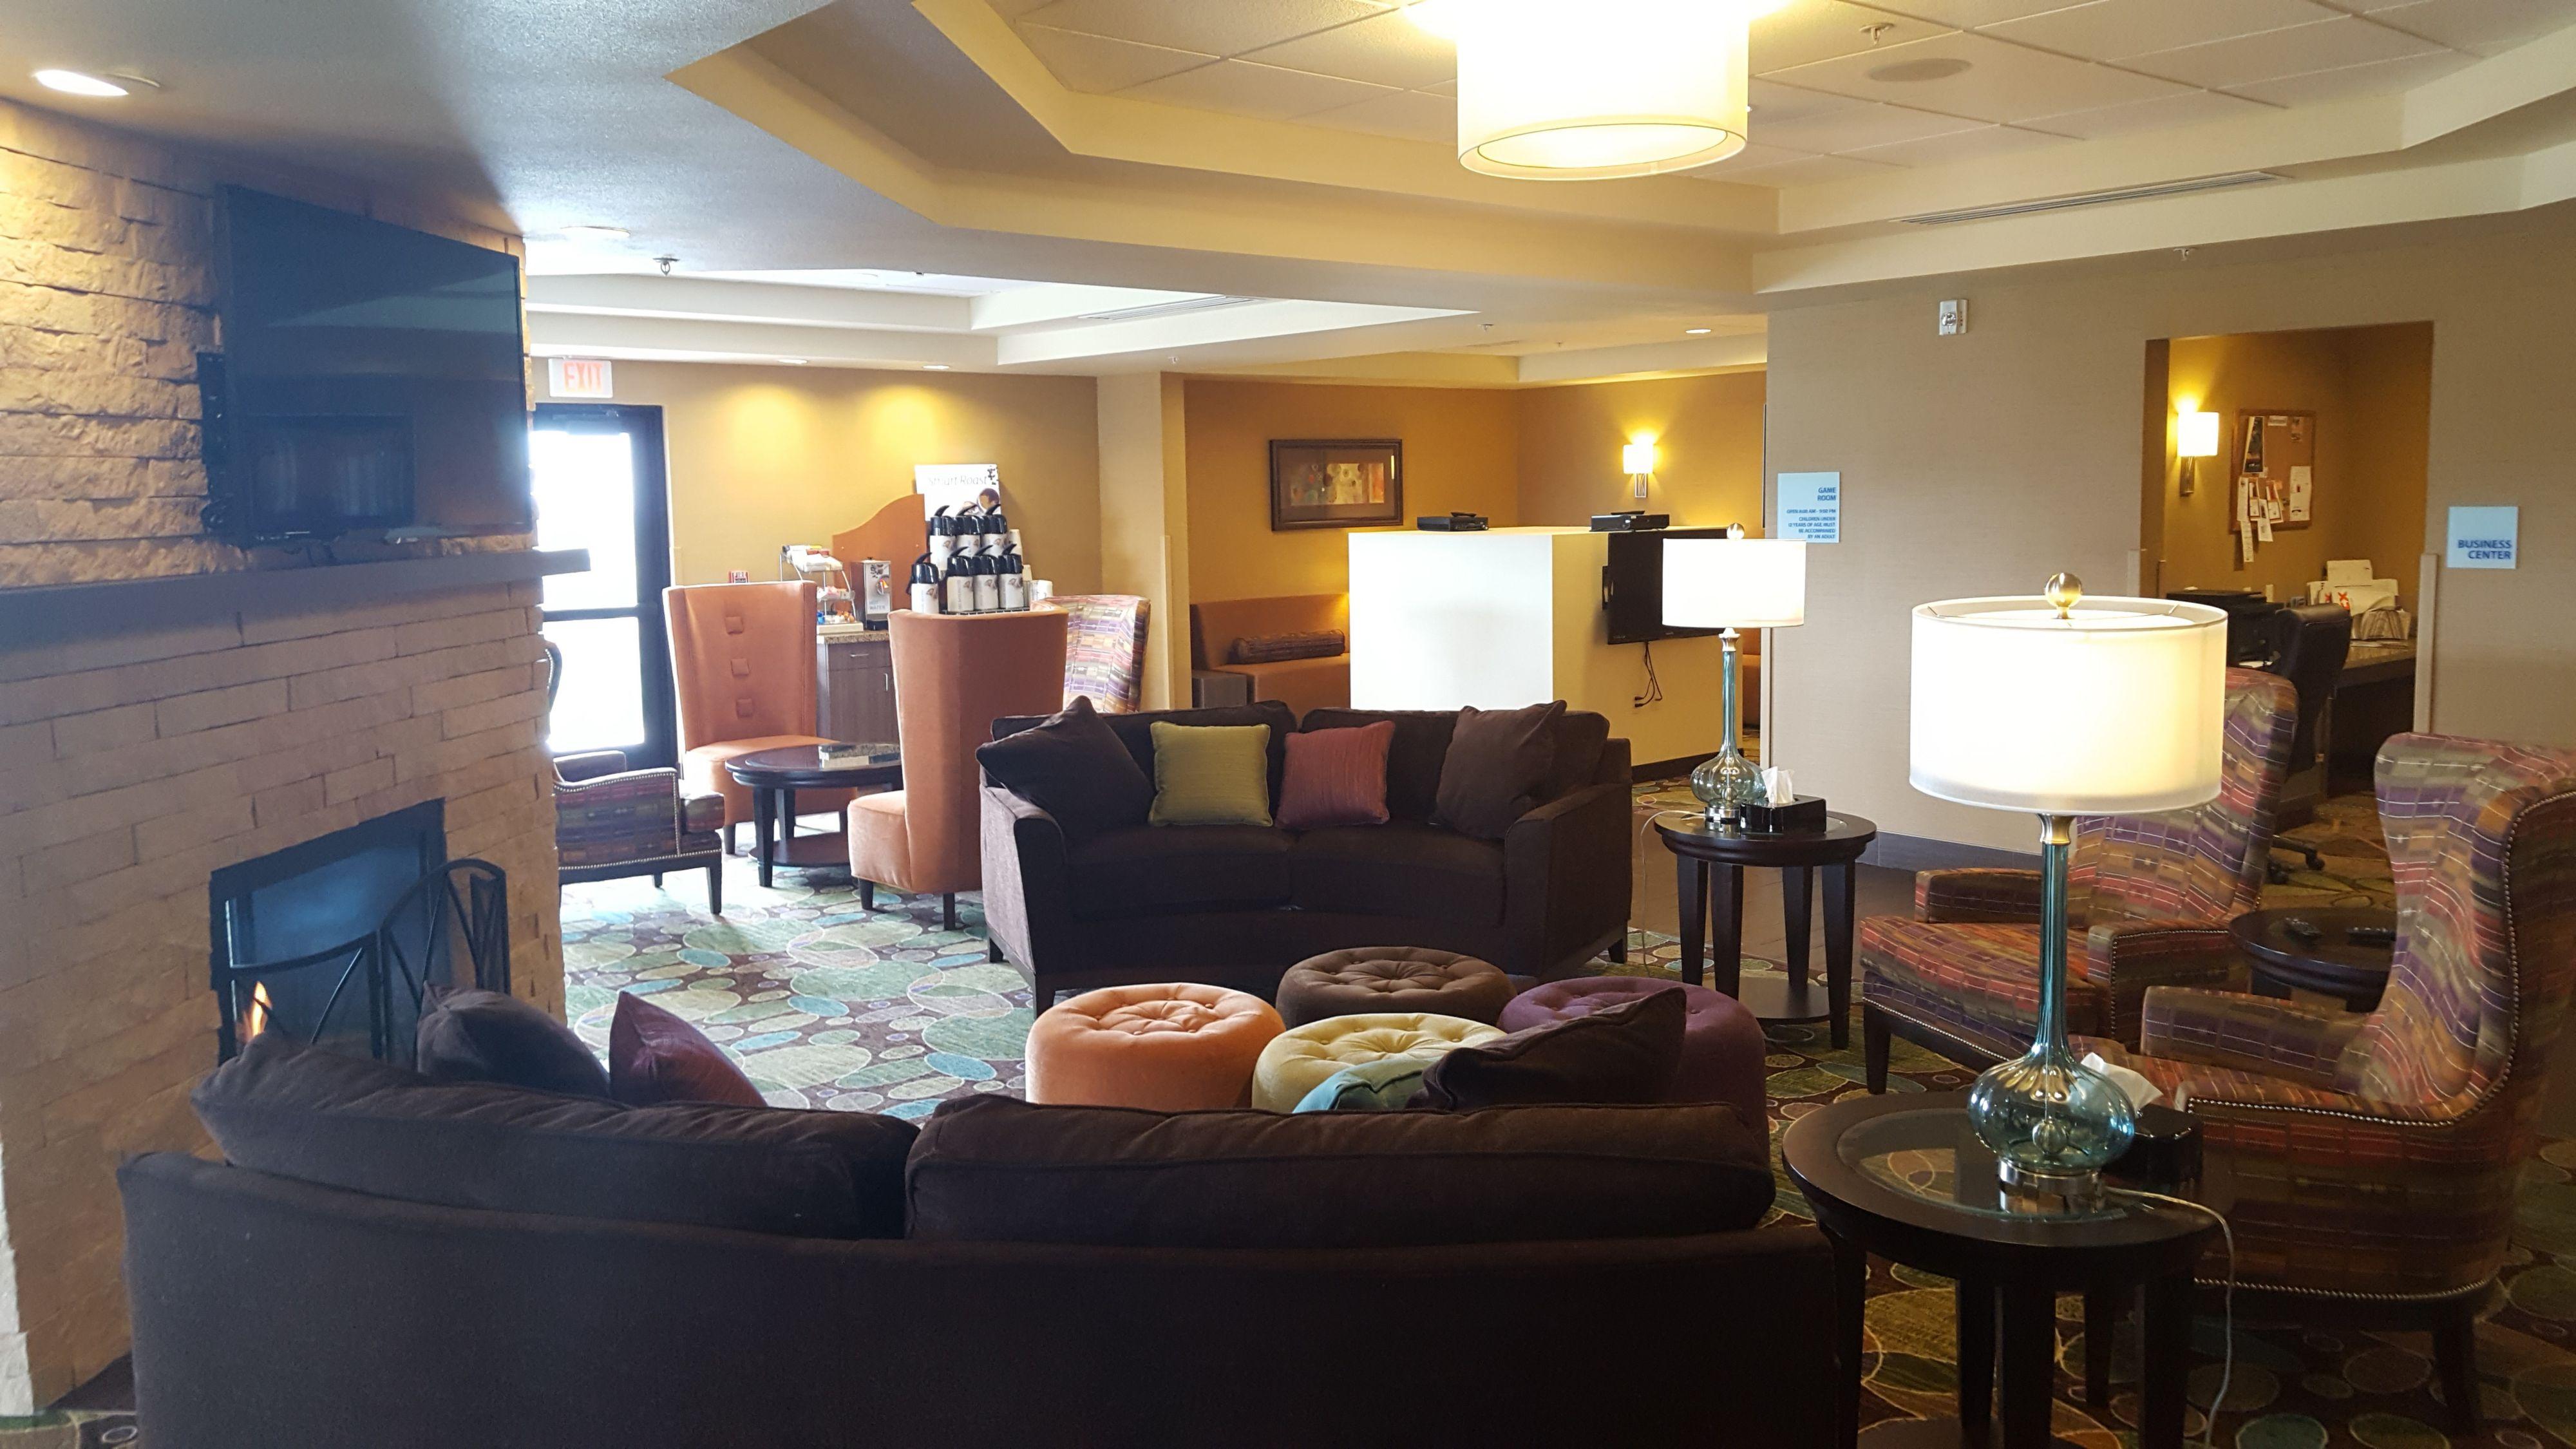 Holiday Inn Express & Suites Pocatello image 5